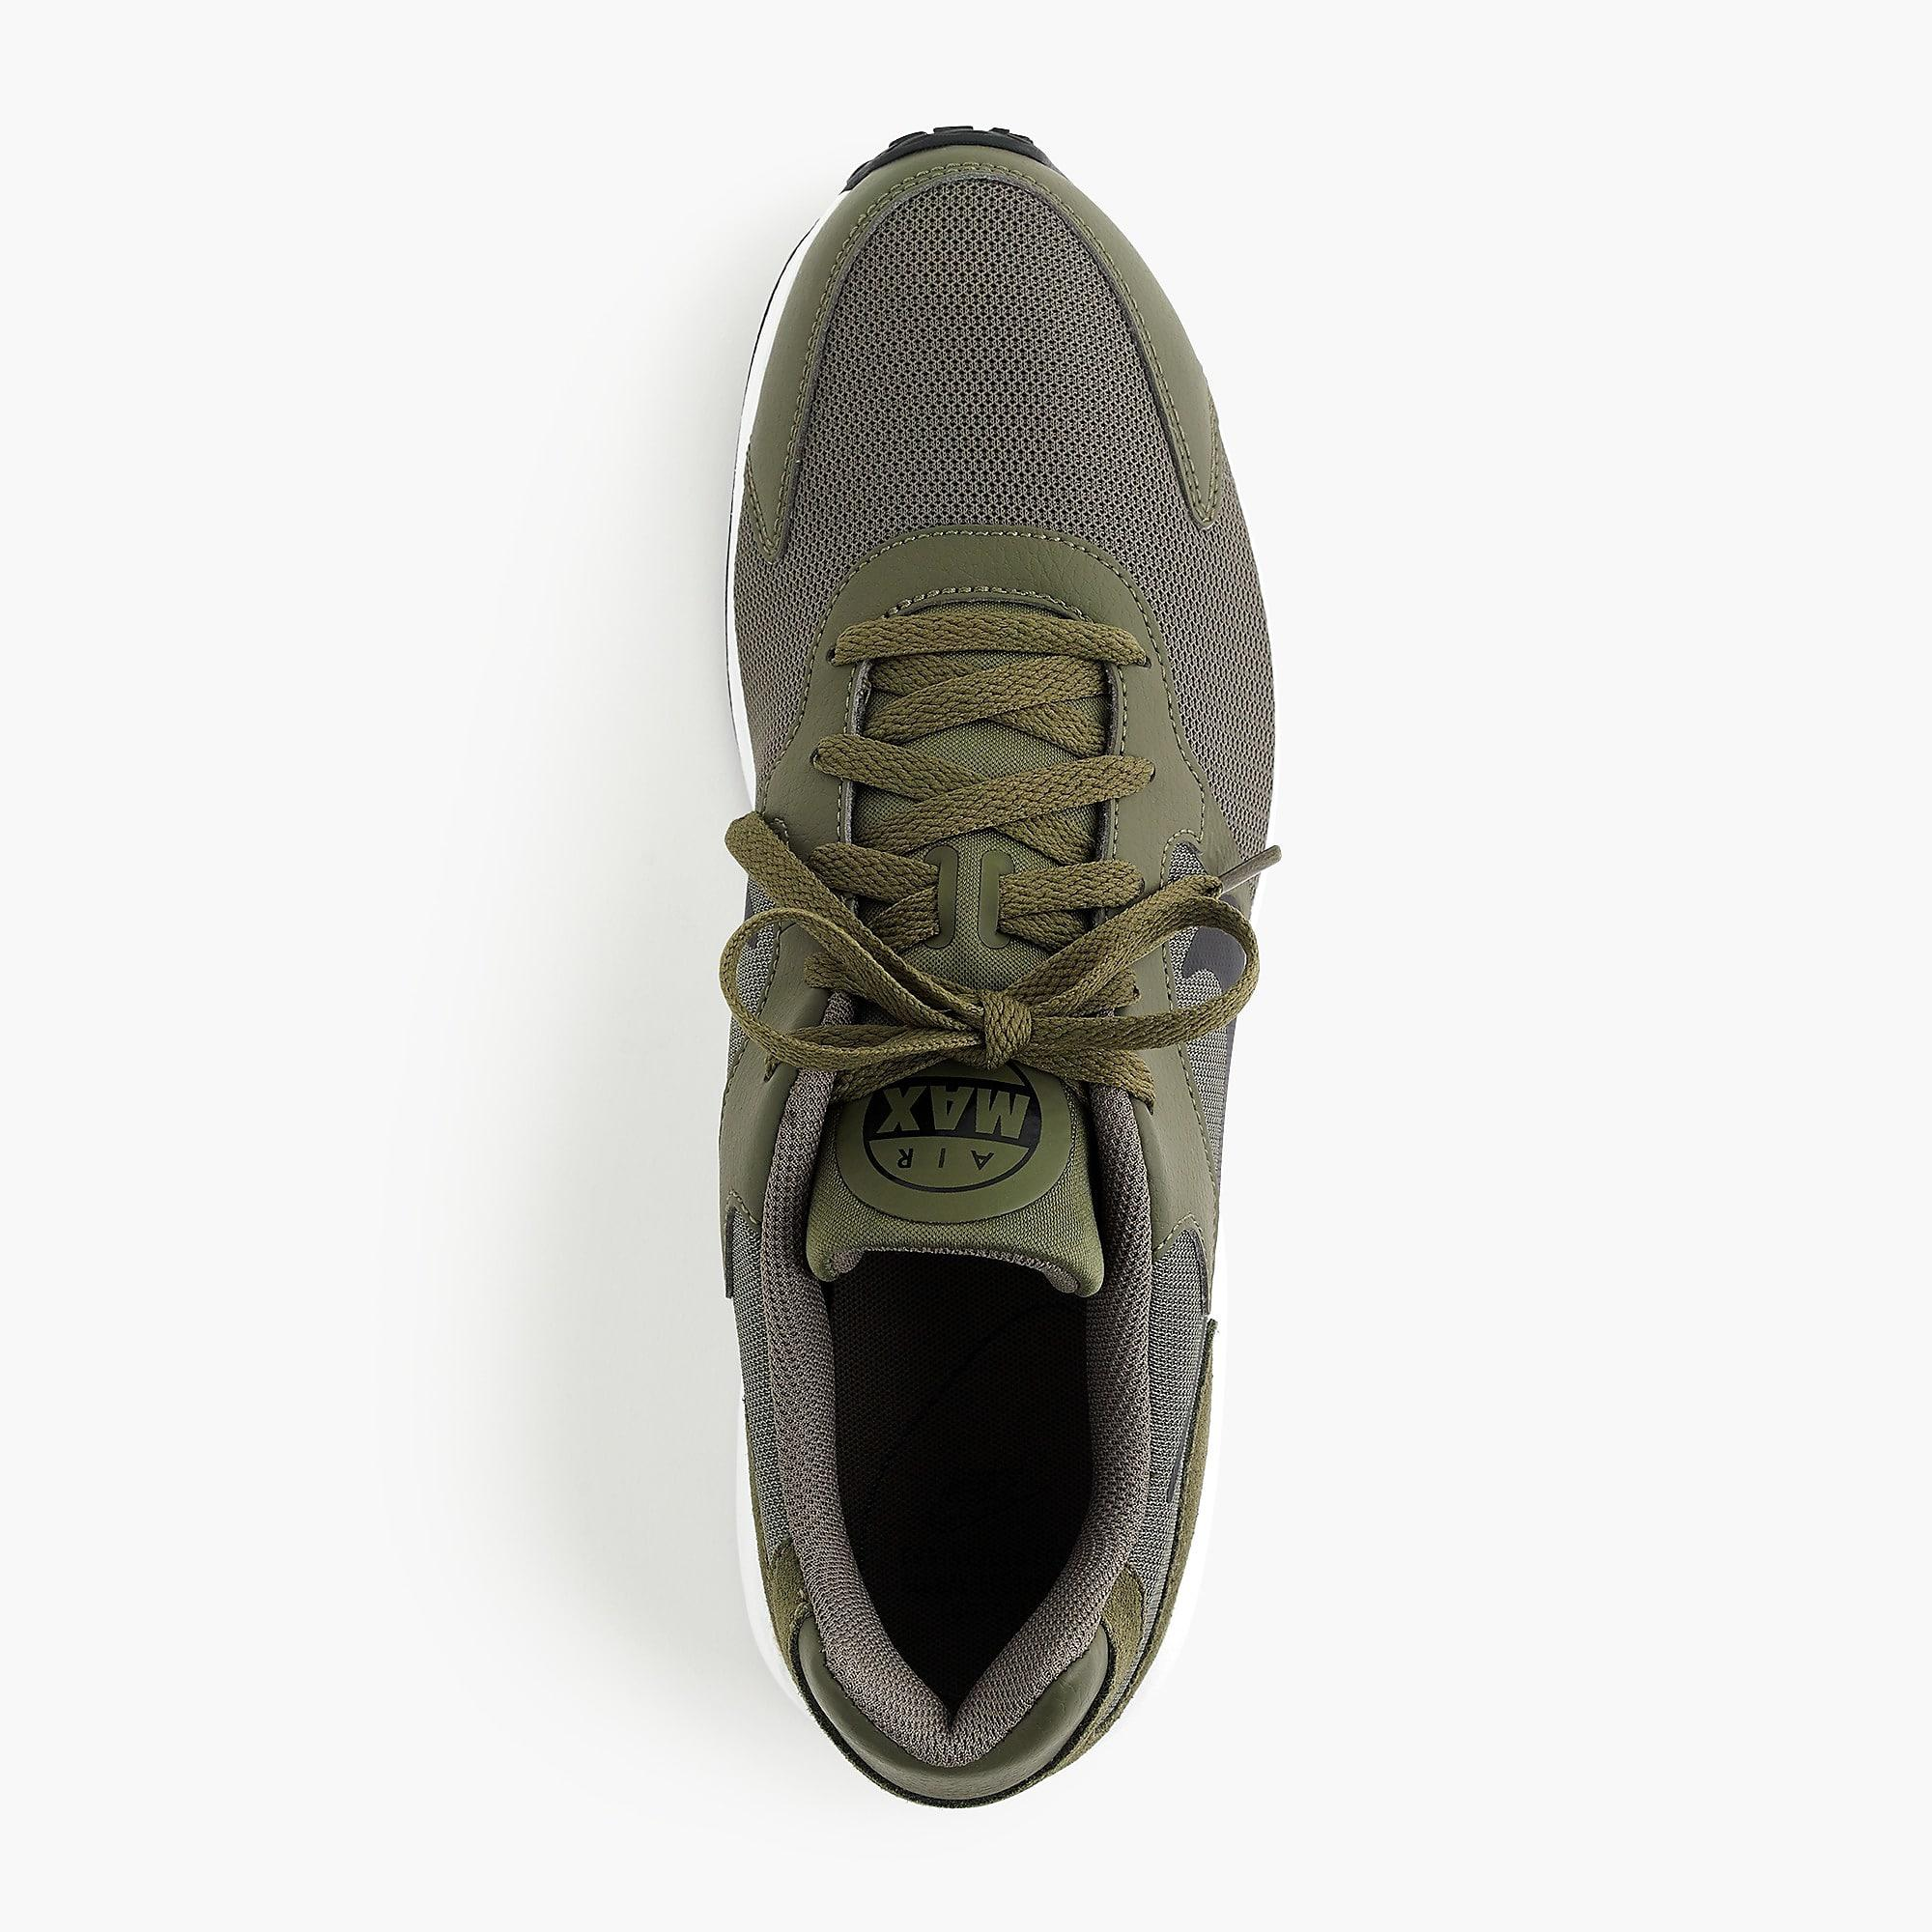 J.Crew: Nike® Air Max Guile In Olive